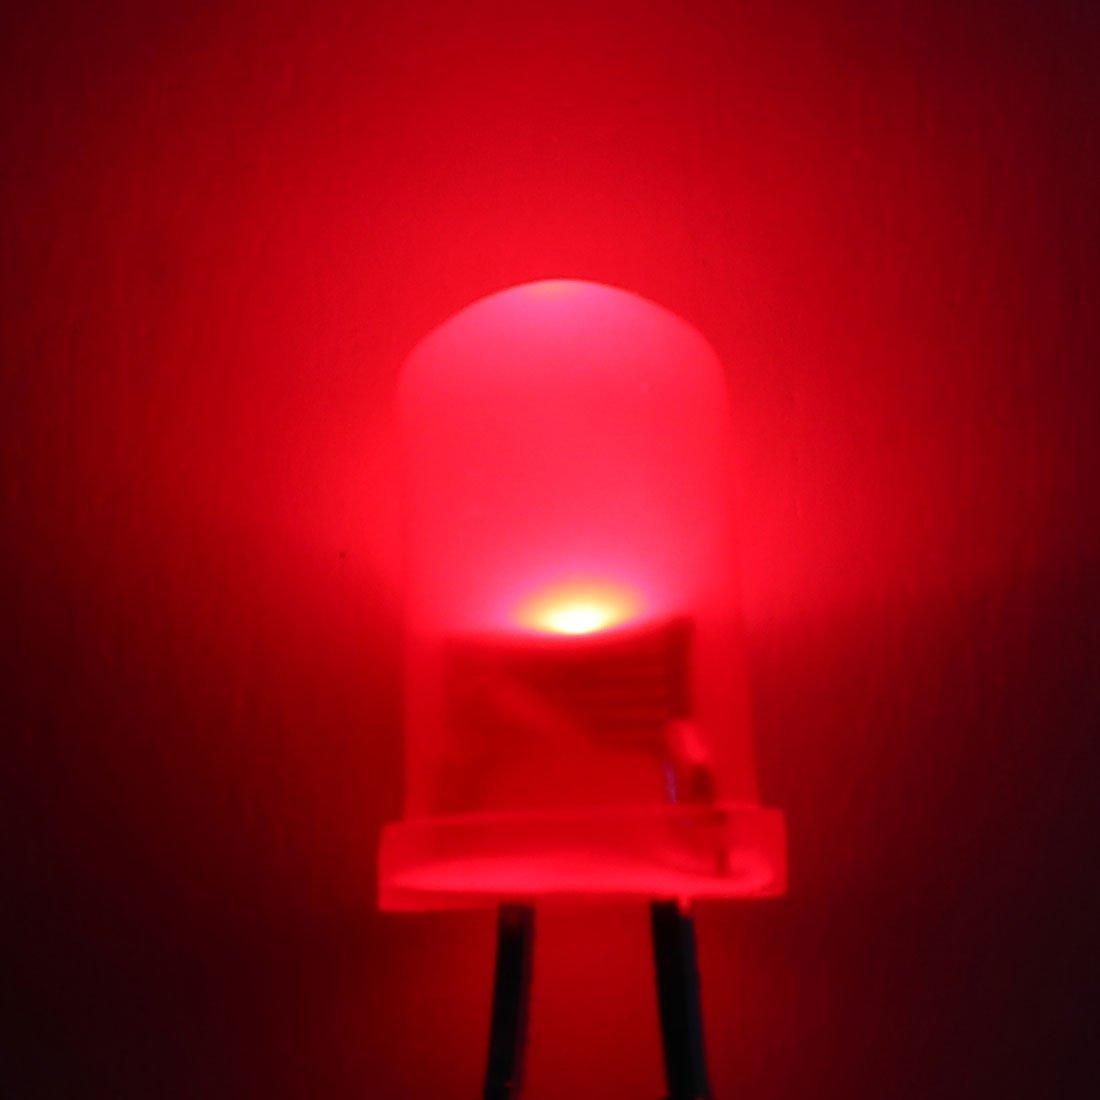 uxcell 100pcs 5mm Multicolor Fast Flashing Dynamics LED Diode Lights Bright Lighting Bulb Lamps Electronics Components Filcker Light Emitting Diodes 3-3.2V